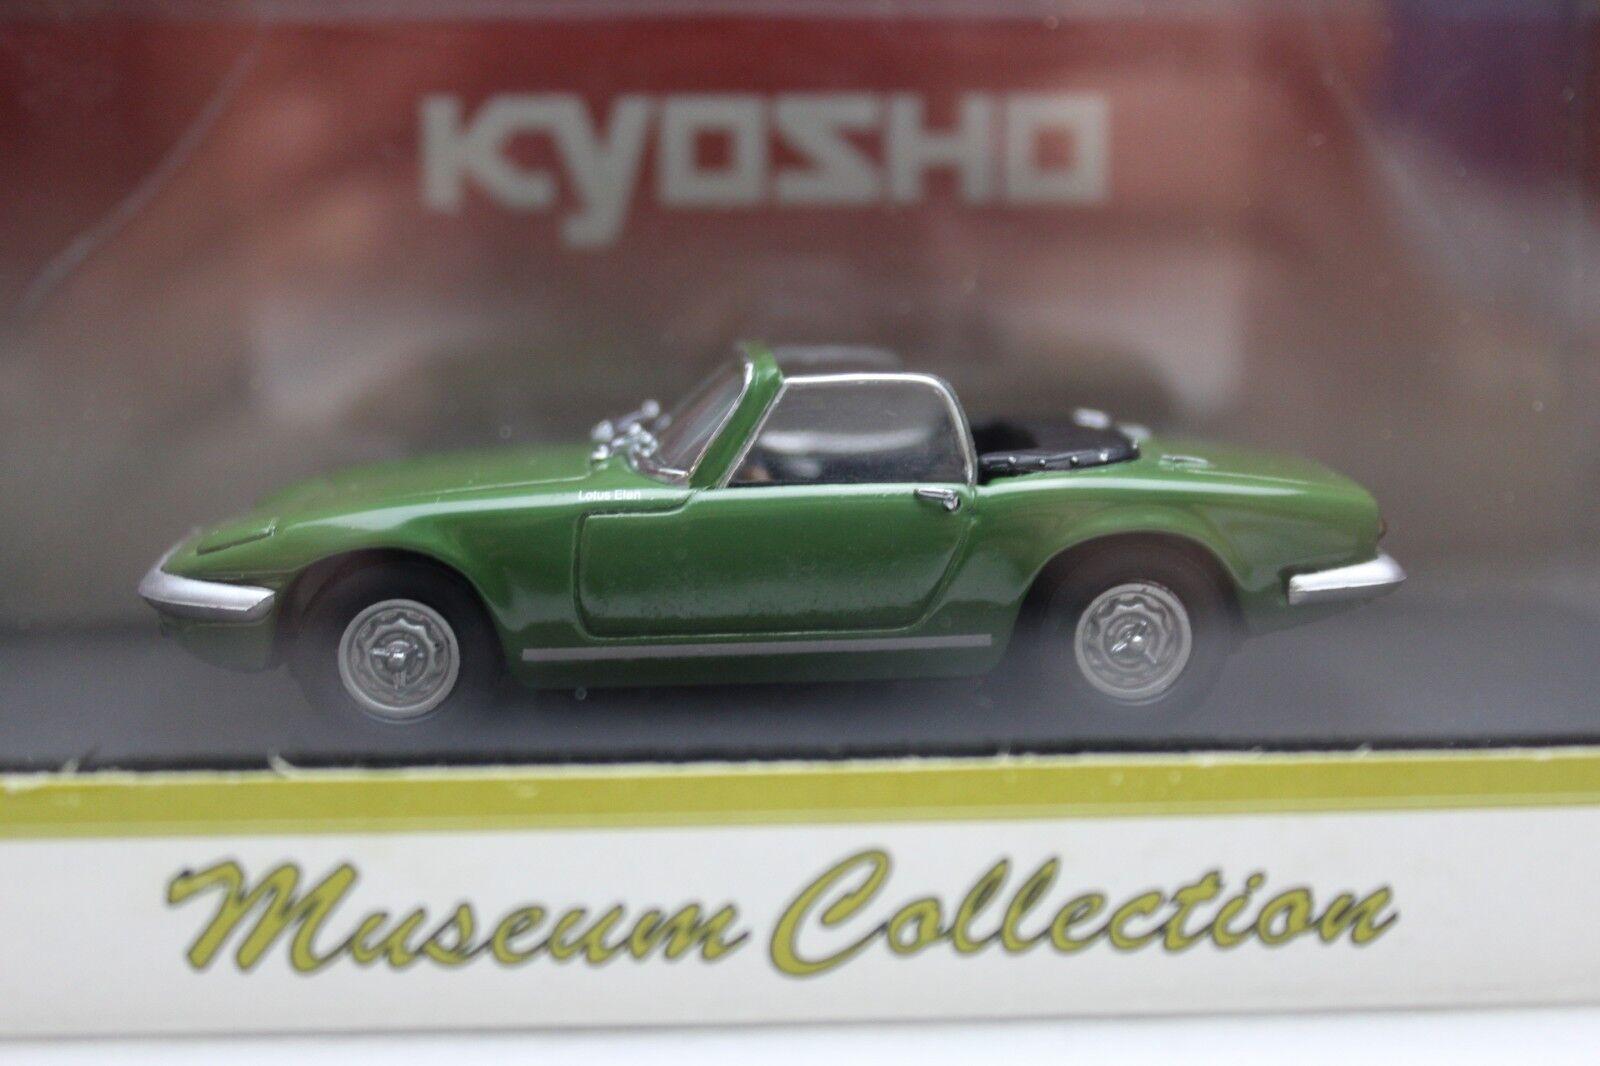 KYOSHO Lotus Elan S3 Open Green Museum Collection 1 43 Model Car New 03041G